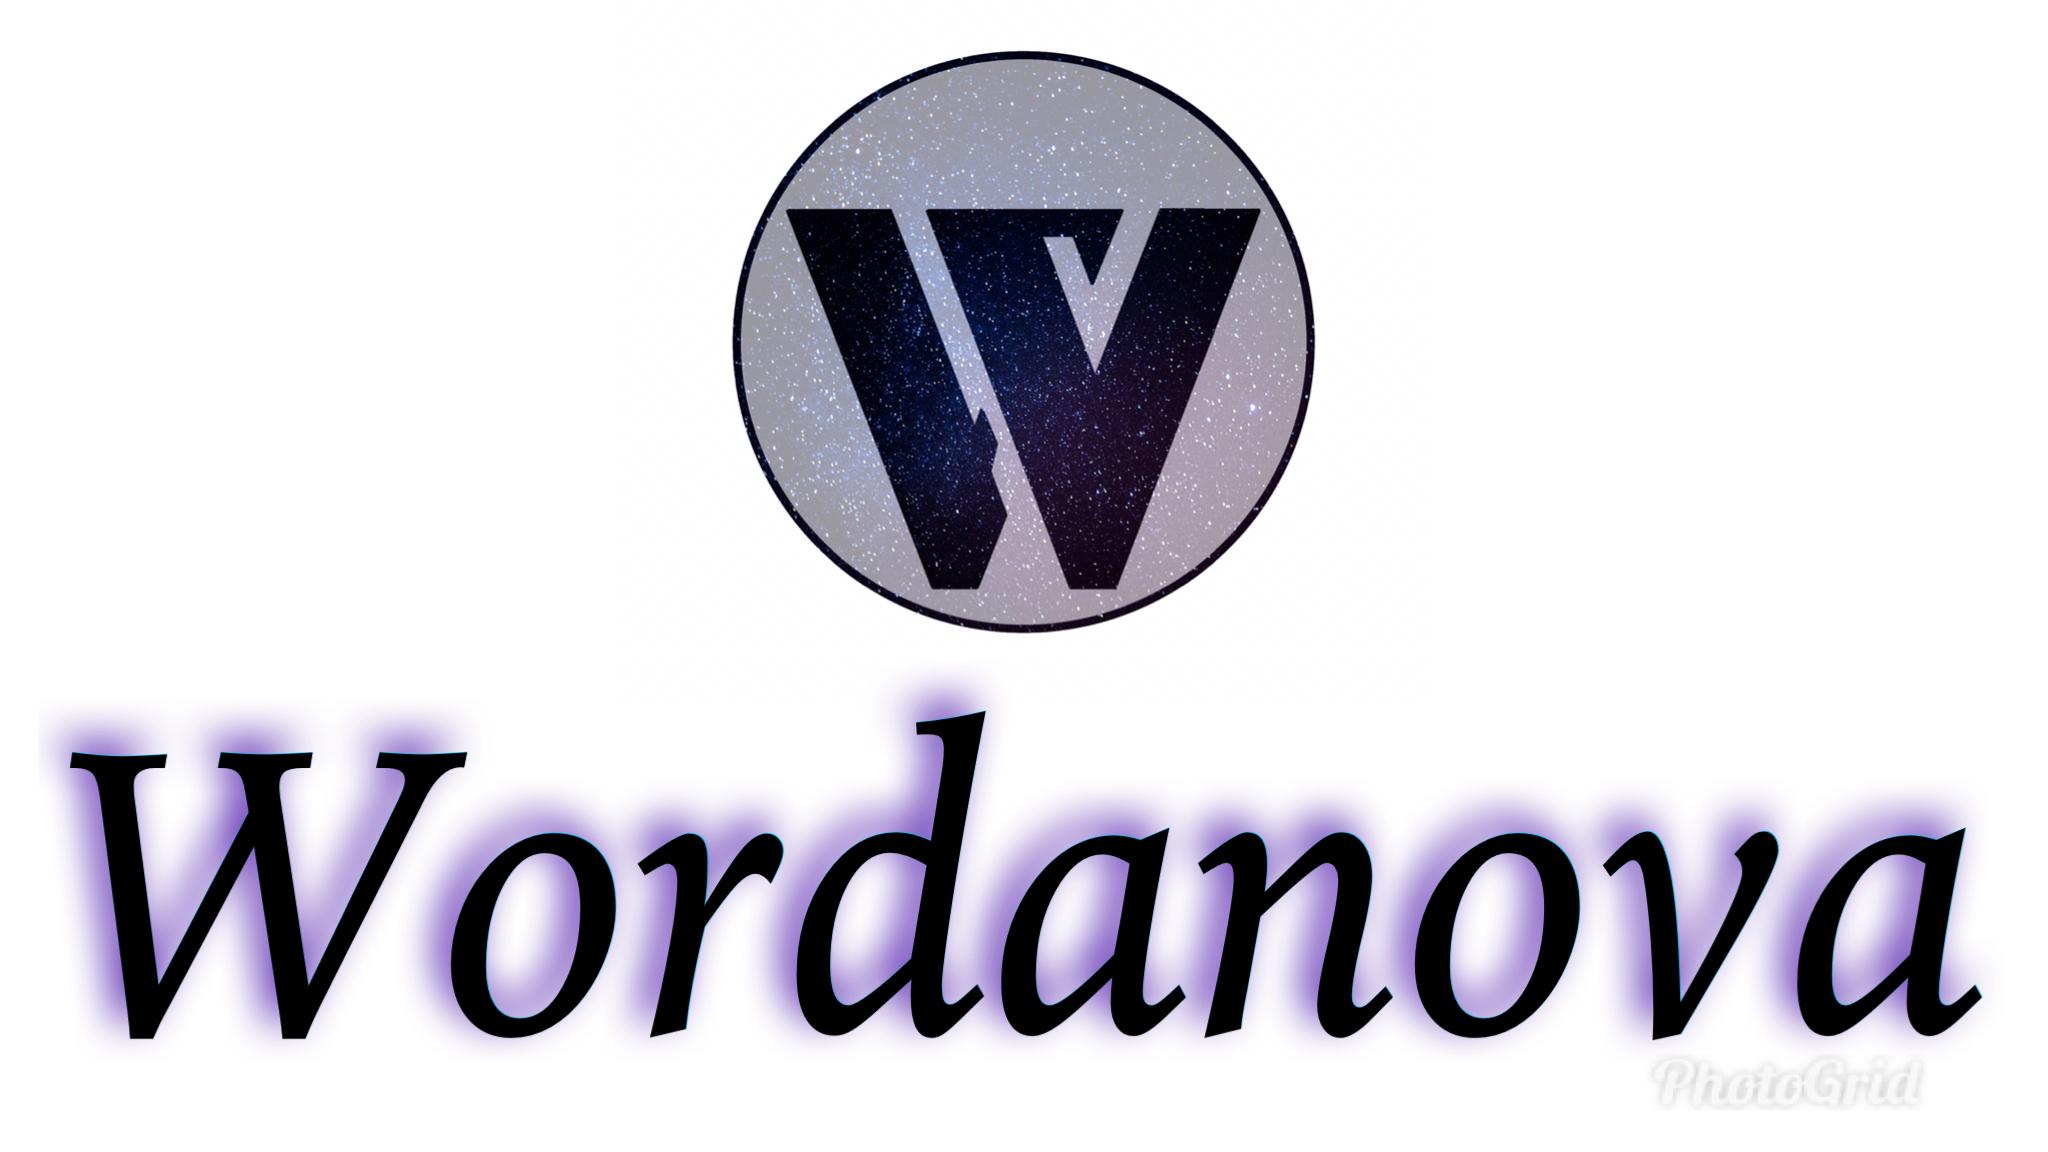 Wordanova